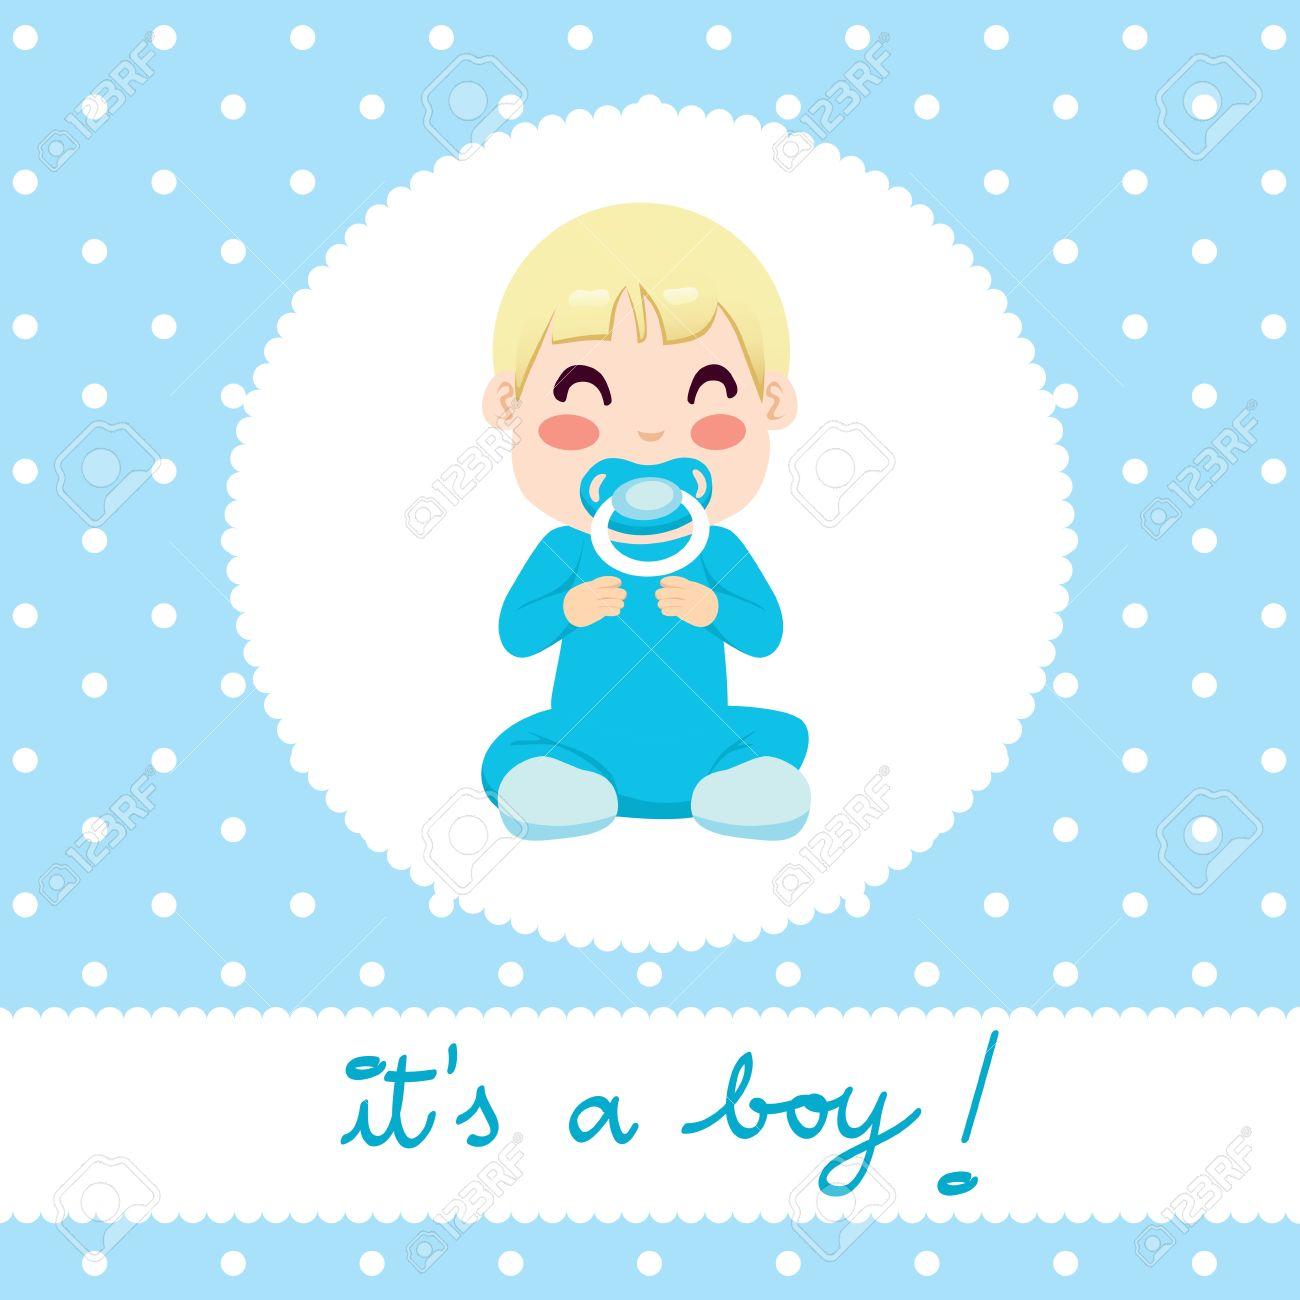 Cute Illustration Design Of Newborn Baby Boy In Blue Onesie – Cute Baby Boy Announcements